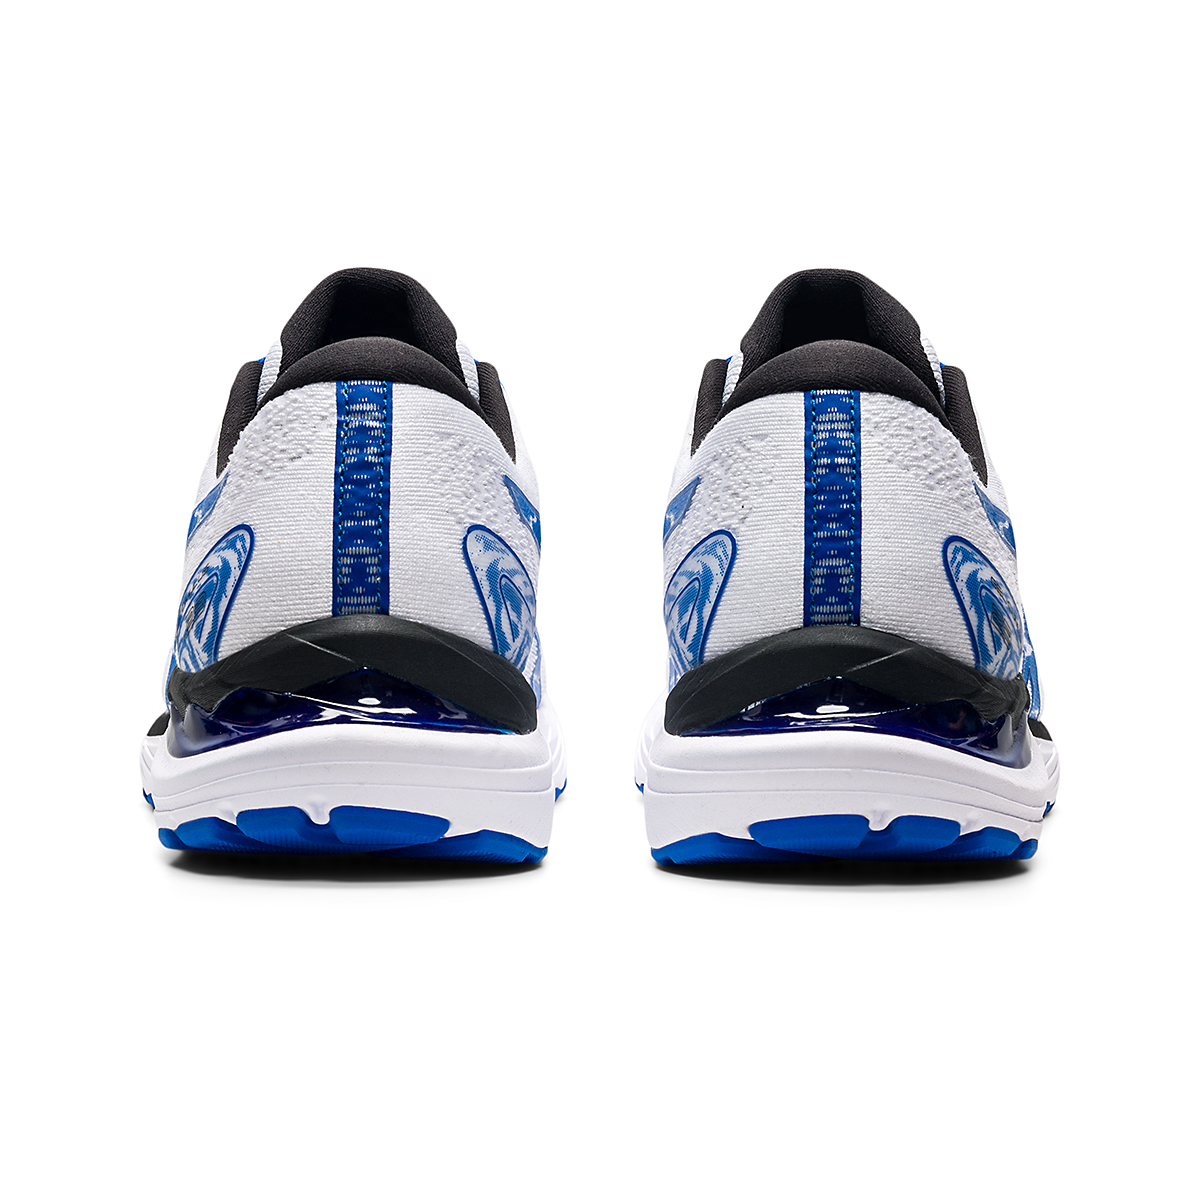 Men's Asics SMU Gel-Cumulus 23 Running Shoe - Color: White/Tuna Blue - Size: 6 - Width: Regular, White/Tuna Blue, large, image 5